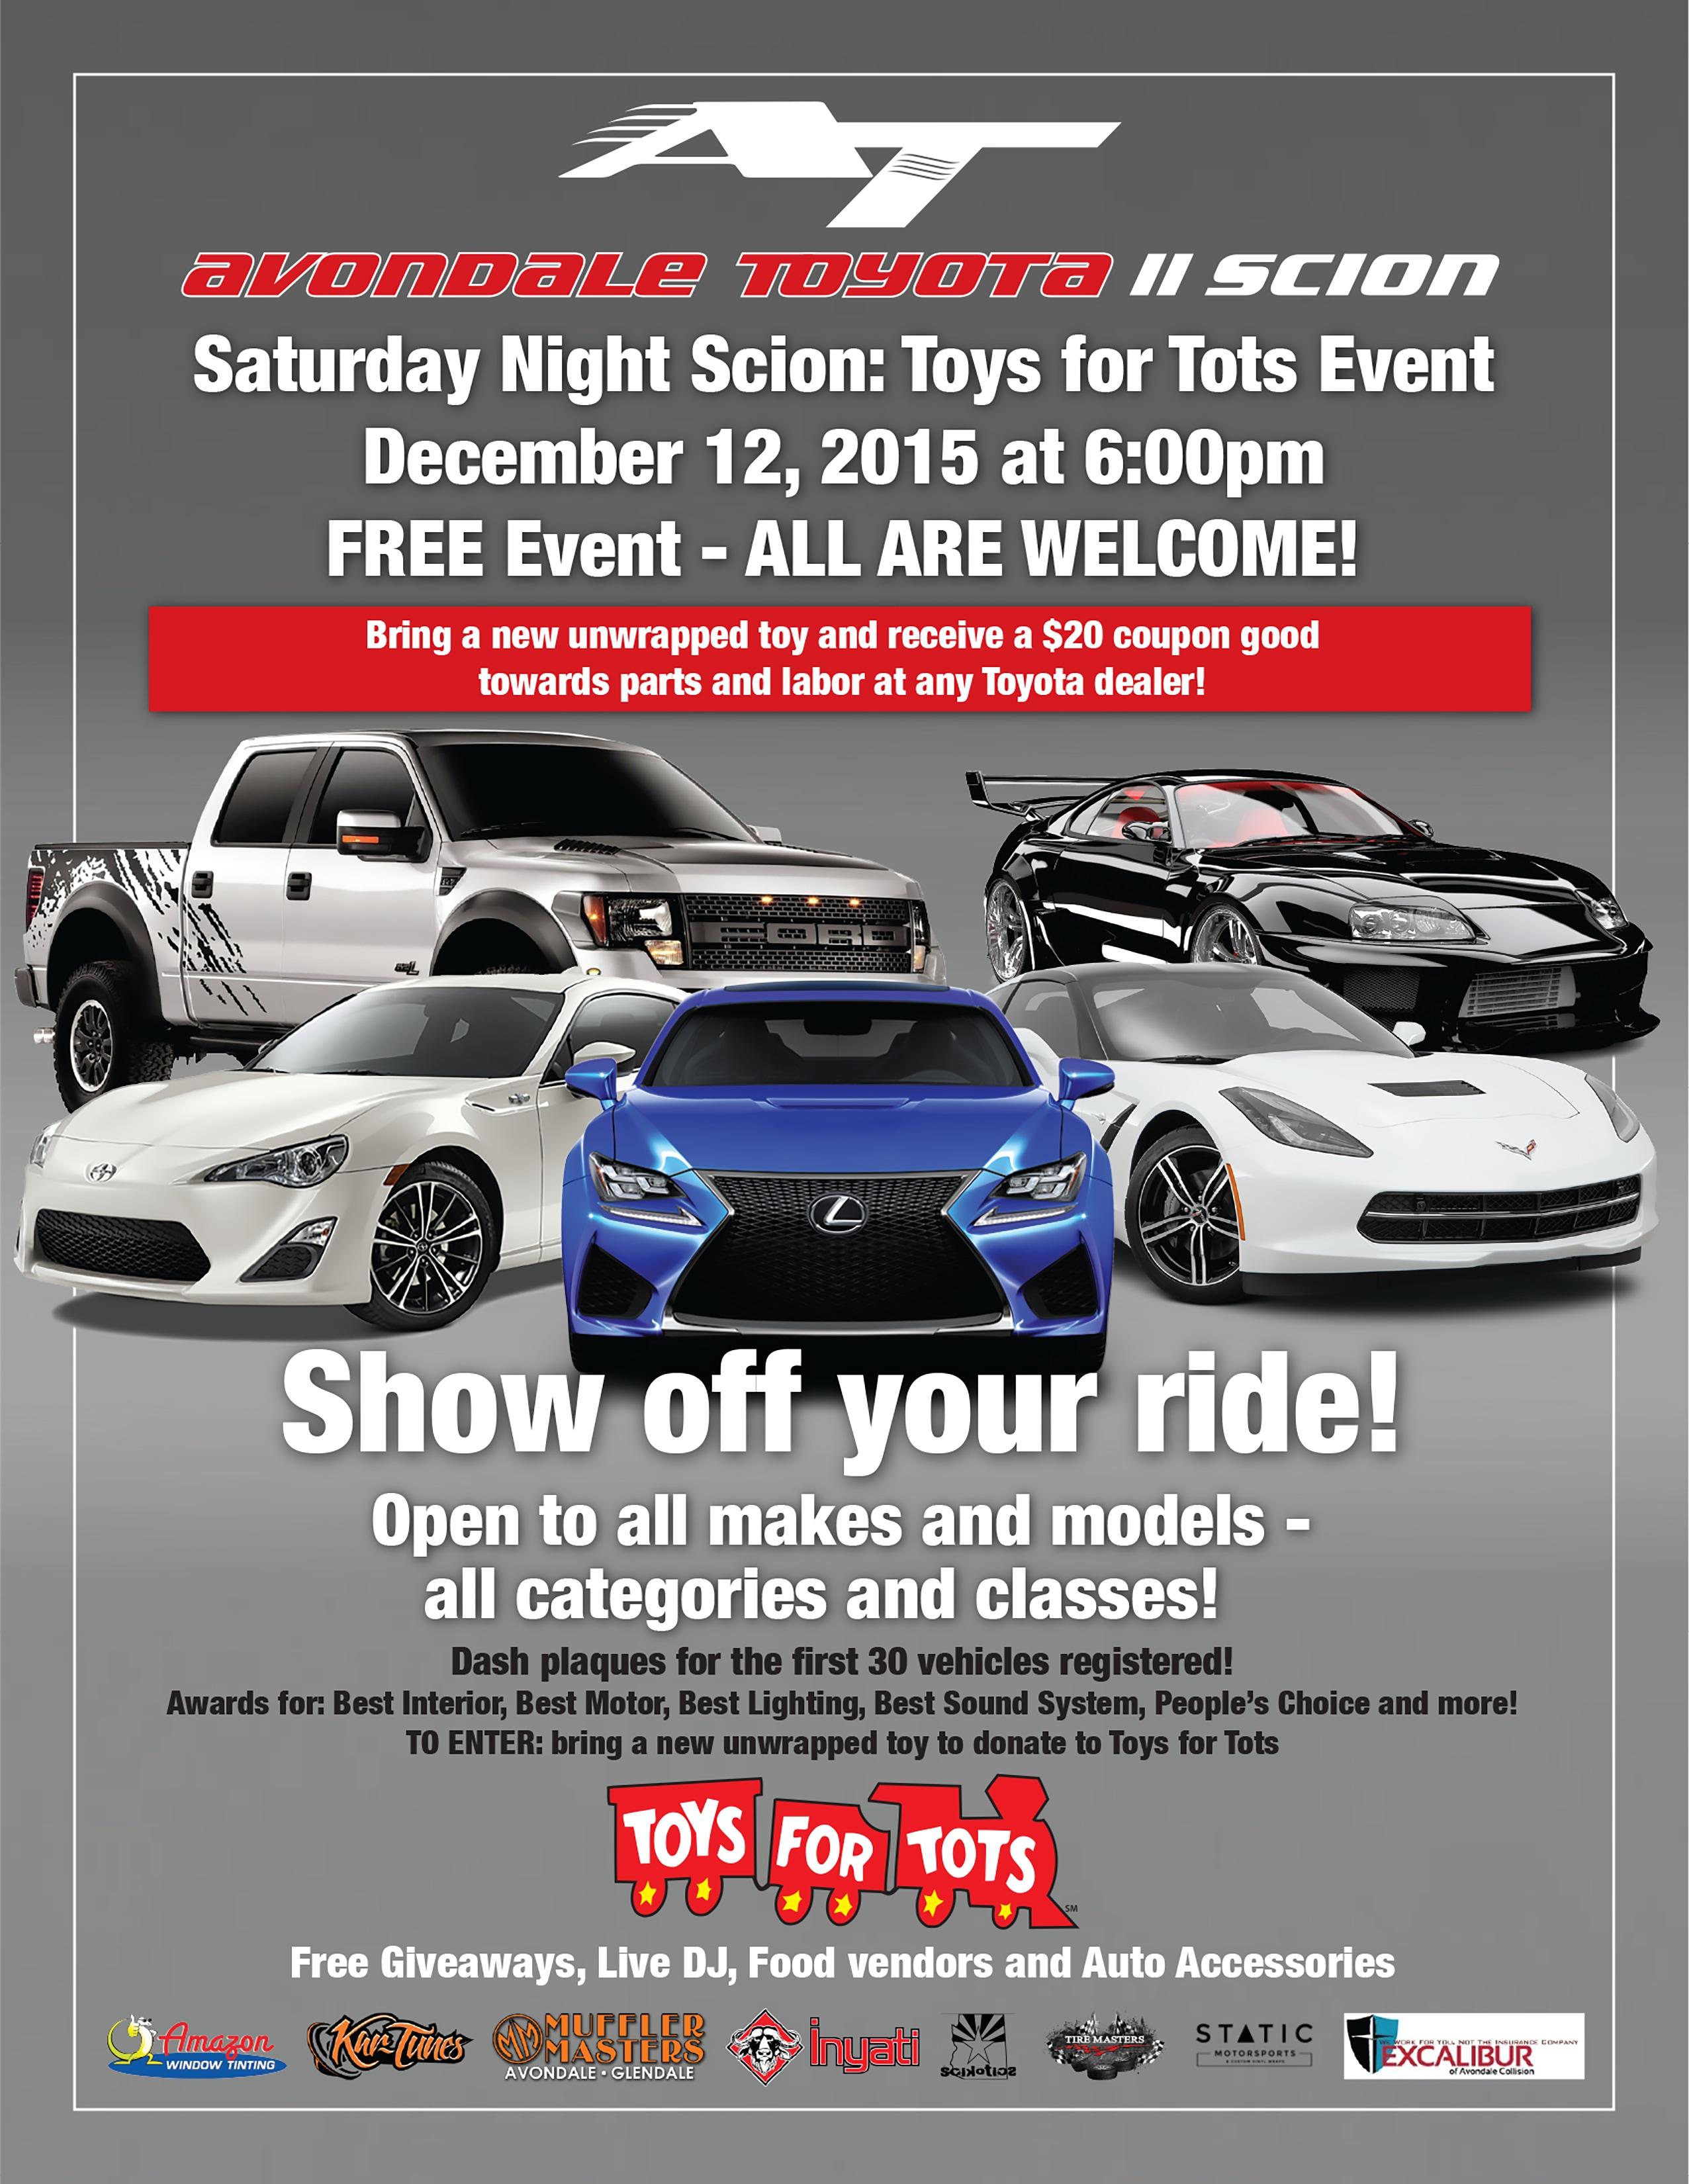 Saturday Night Scion Avondale Toyota Hosts Saturday Night Scion A - Fun car show award categories